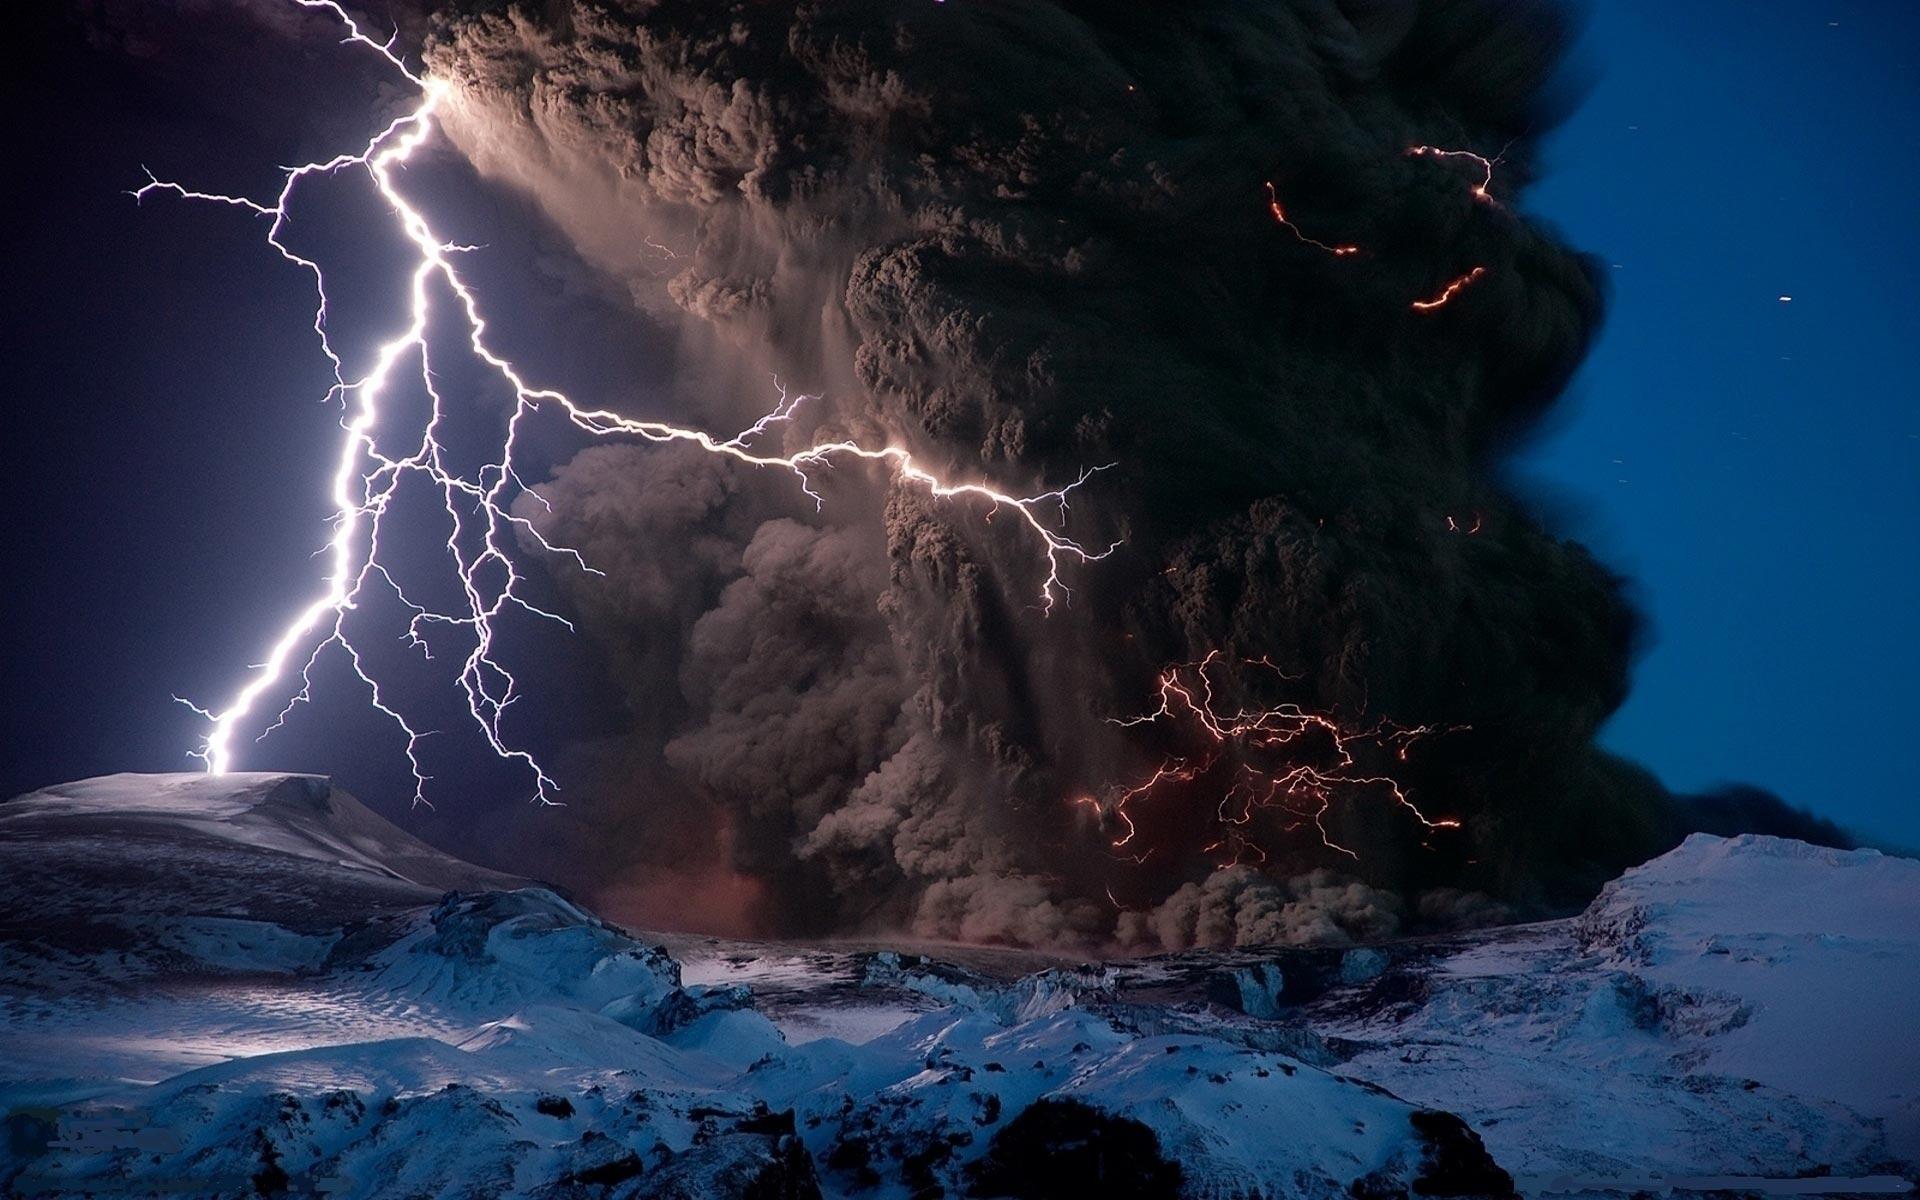 Tornado with Lightning Wallpaper hd wallpaper background desktop 1920x1200